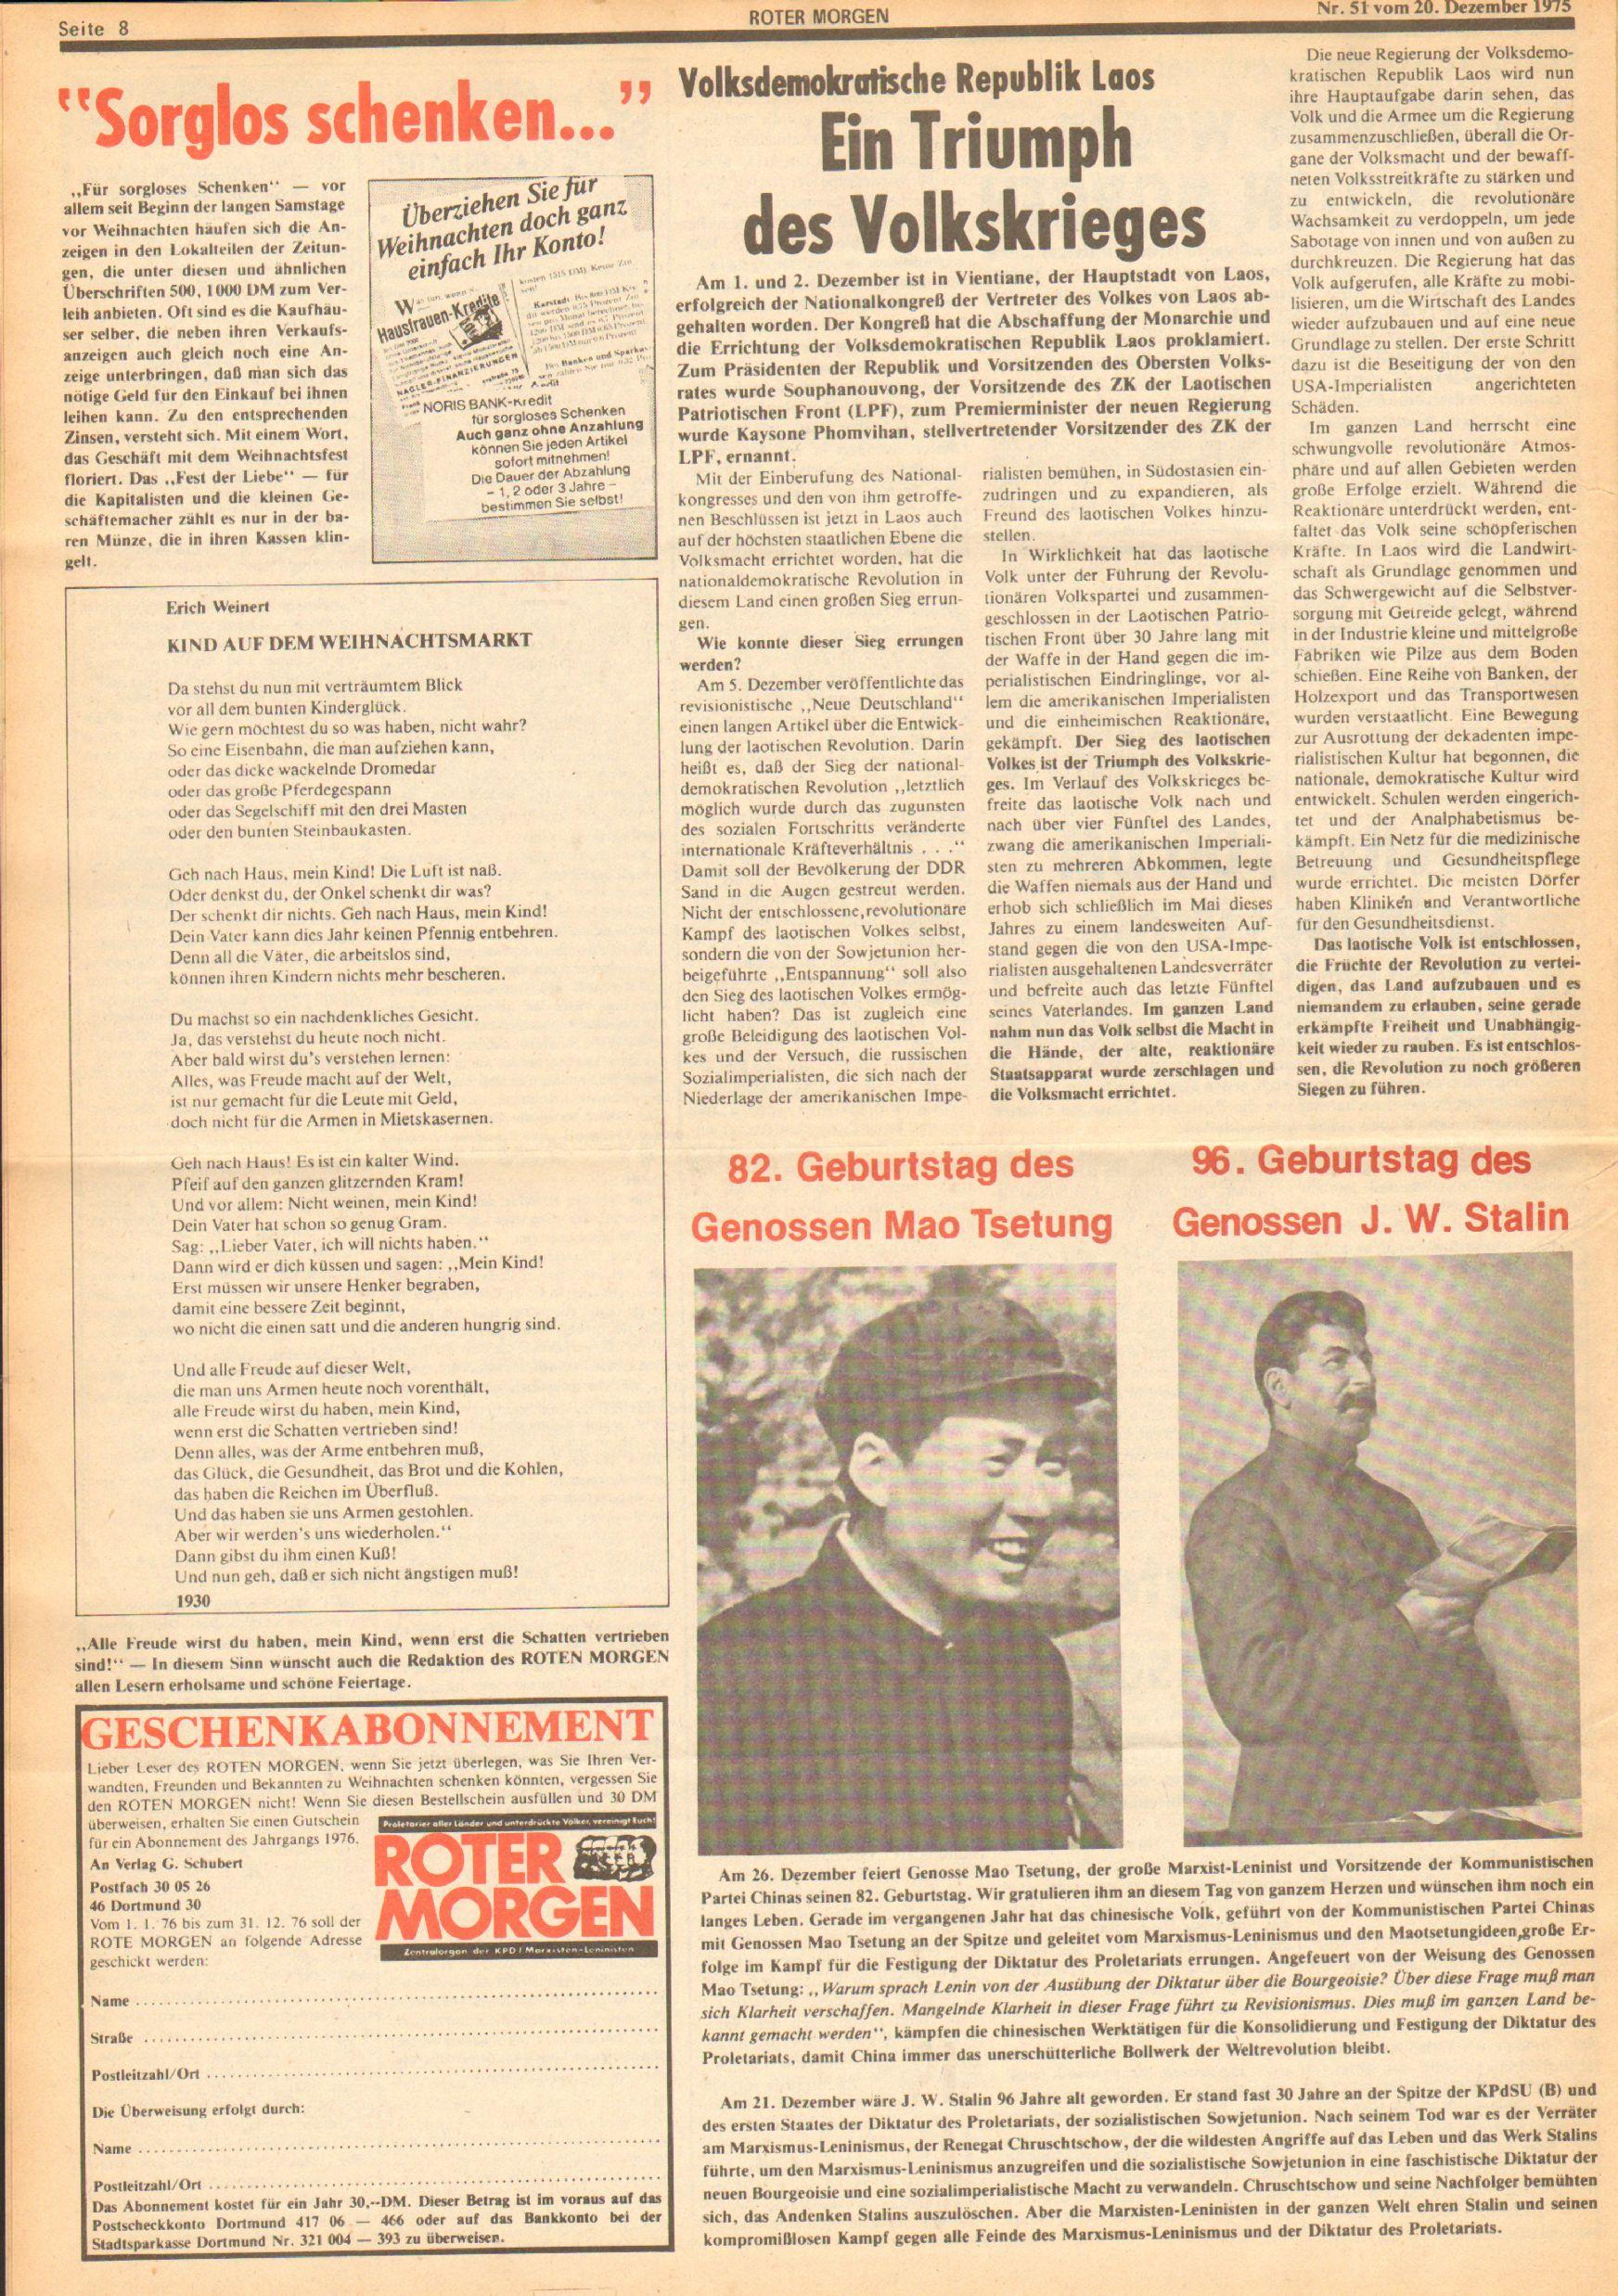 Roter Morgen, 9. Jg., 20. Dezember 1975, Nr. 51, Seite 8